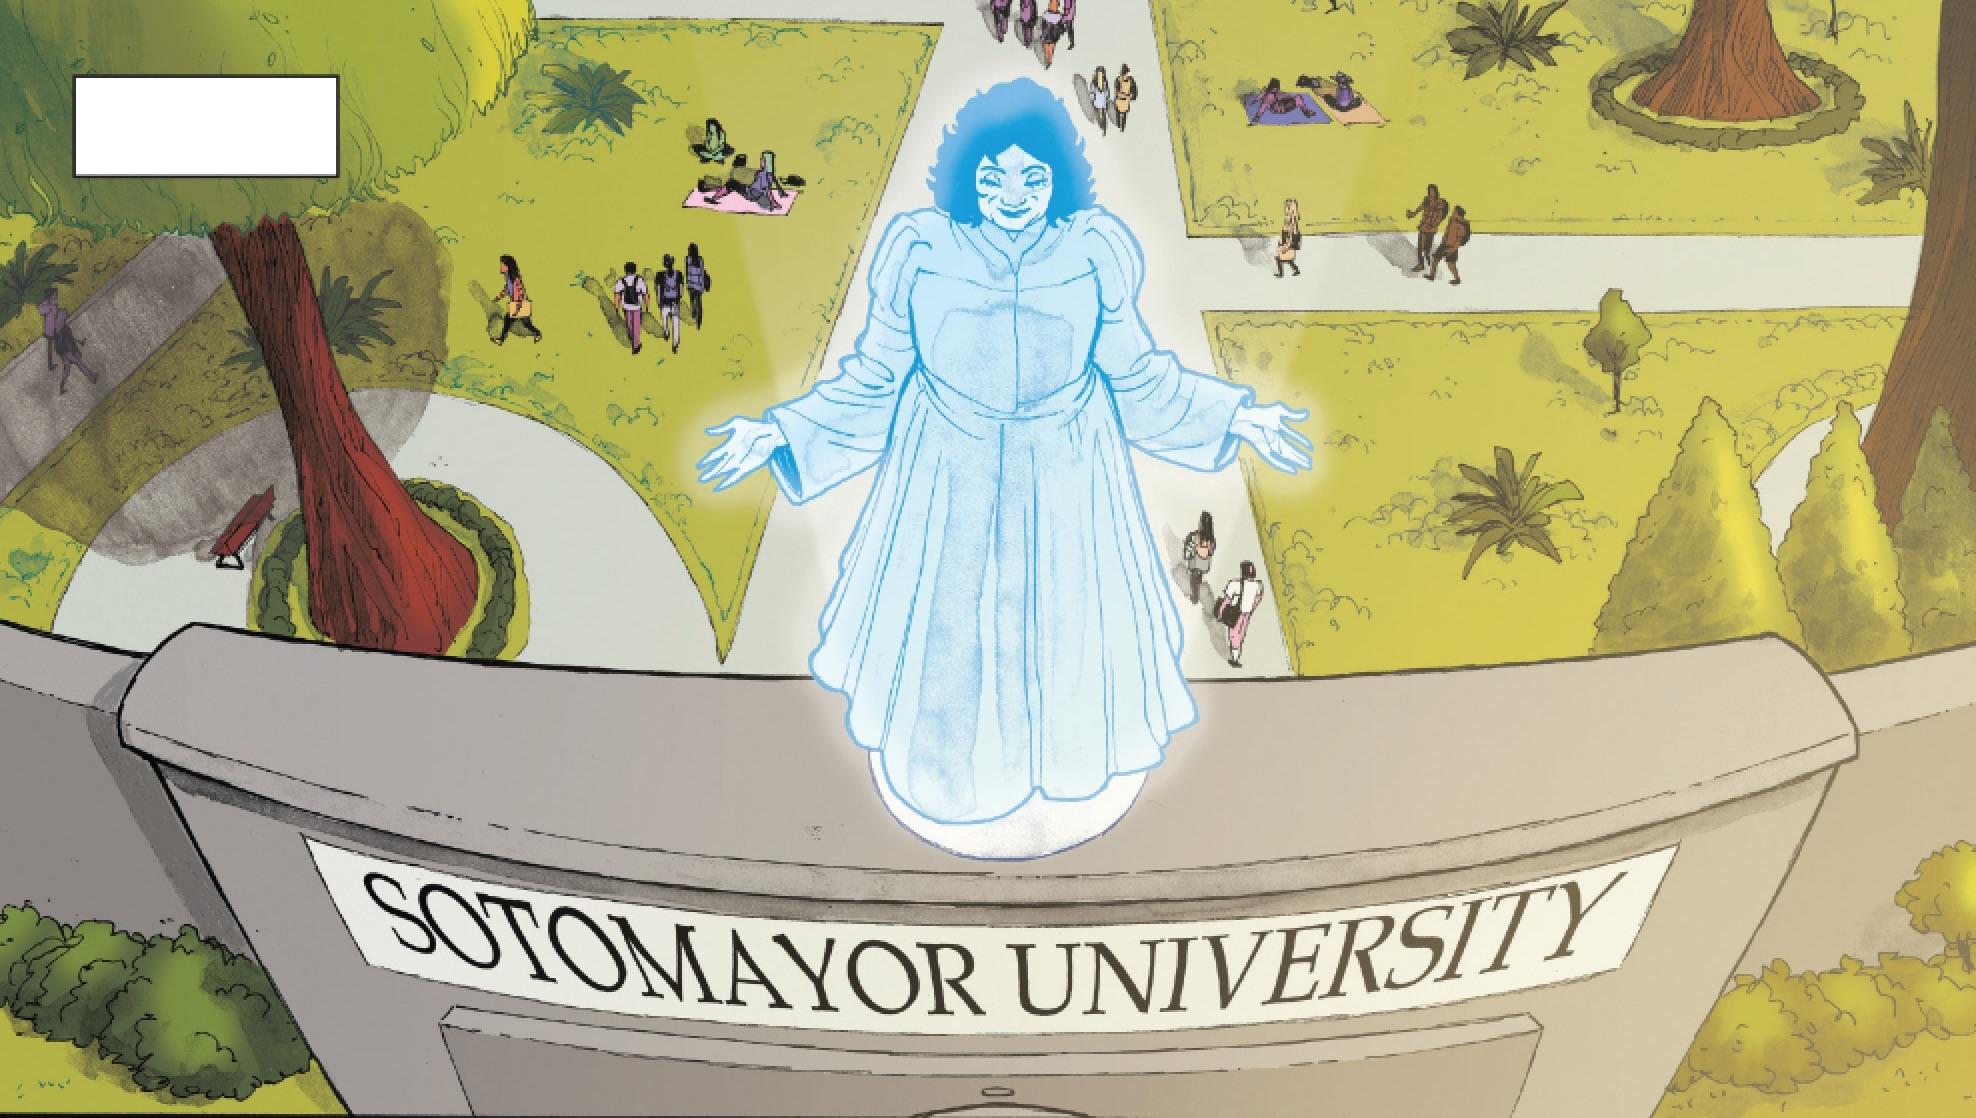 Sotomayor University